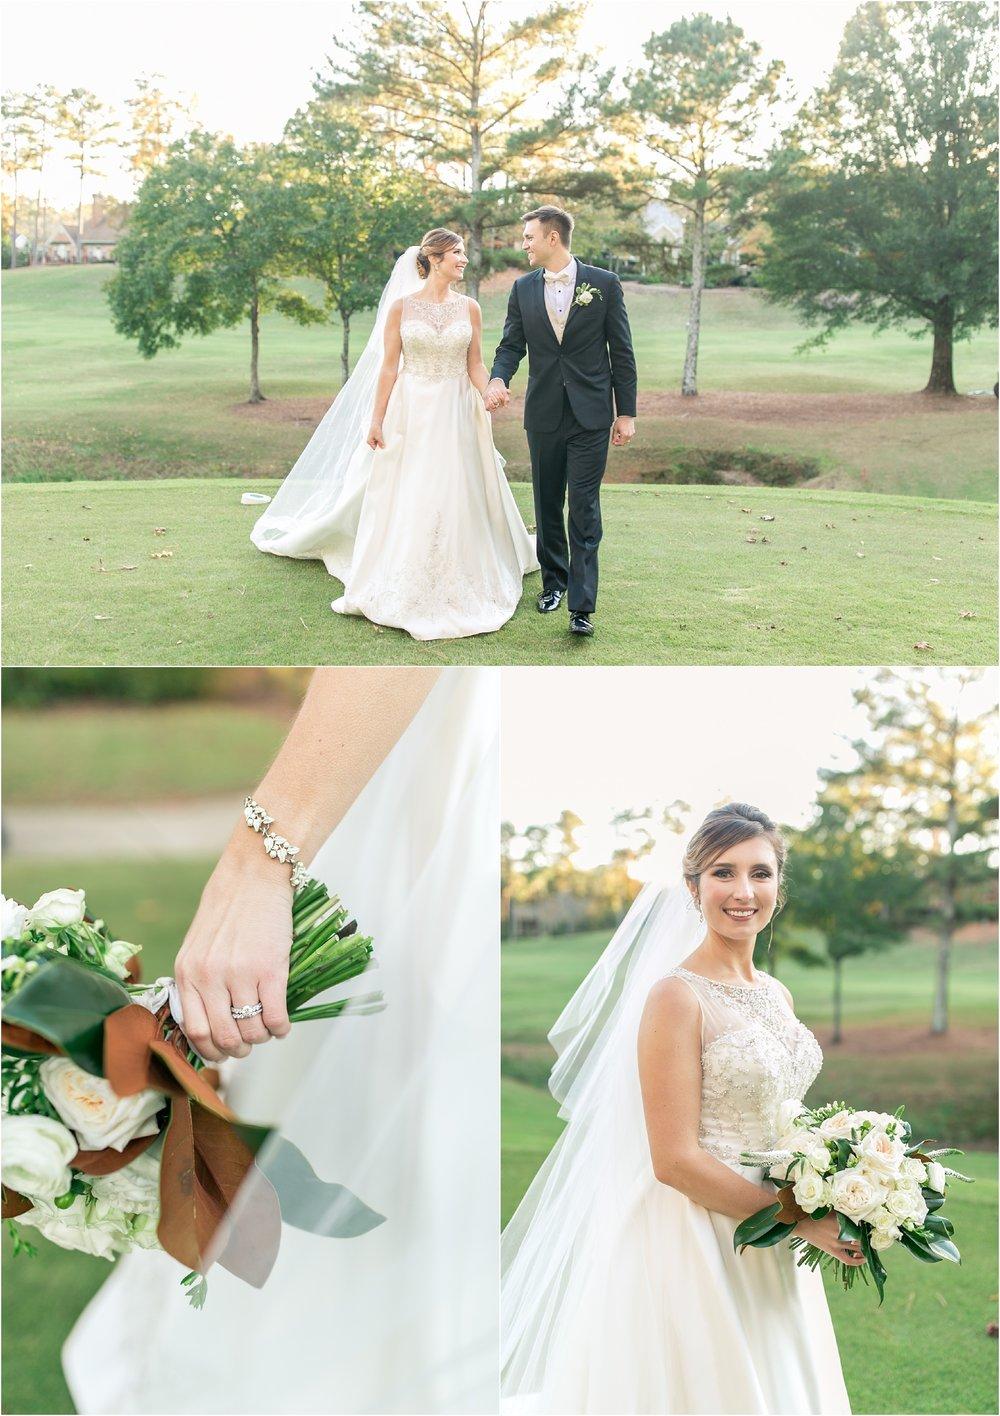 Savannah Eve Photography- Bottiglion-Scope Wedding- Sneak Peek-47.jpg